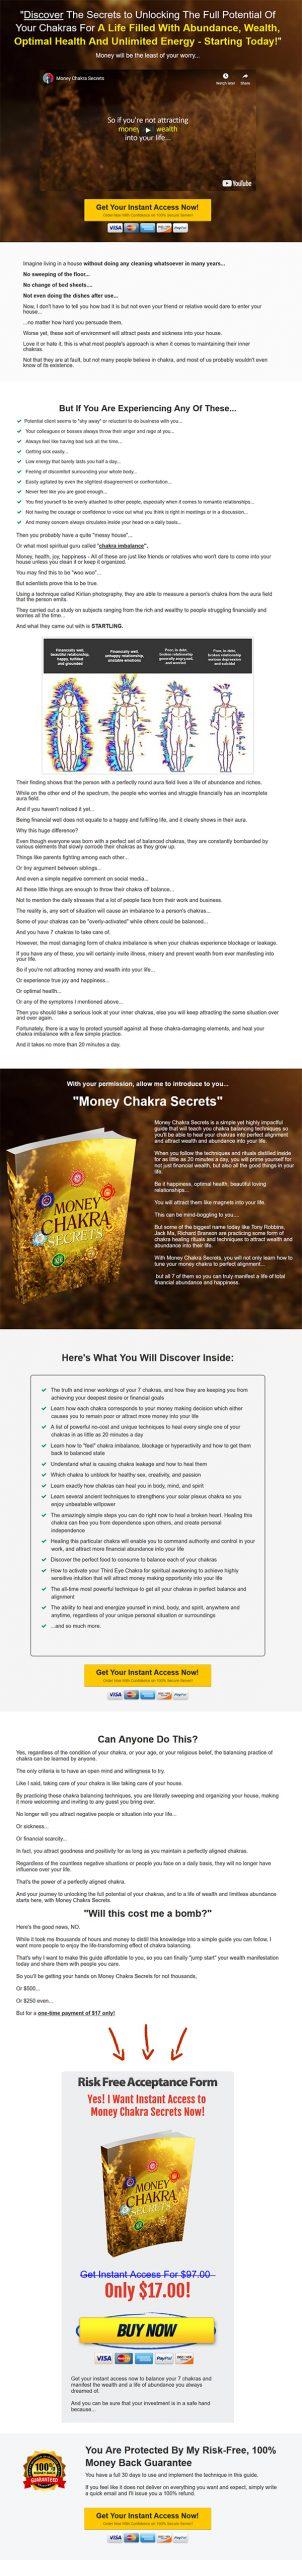 Money Chakra Secrets Ebook and Videos MRR